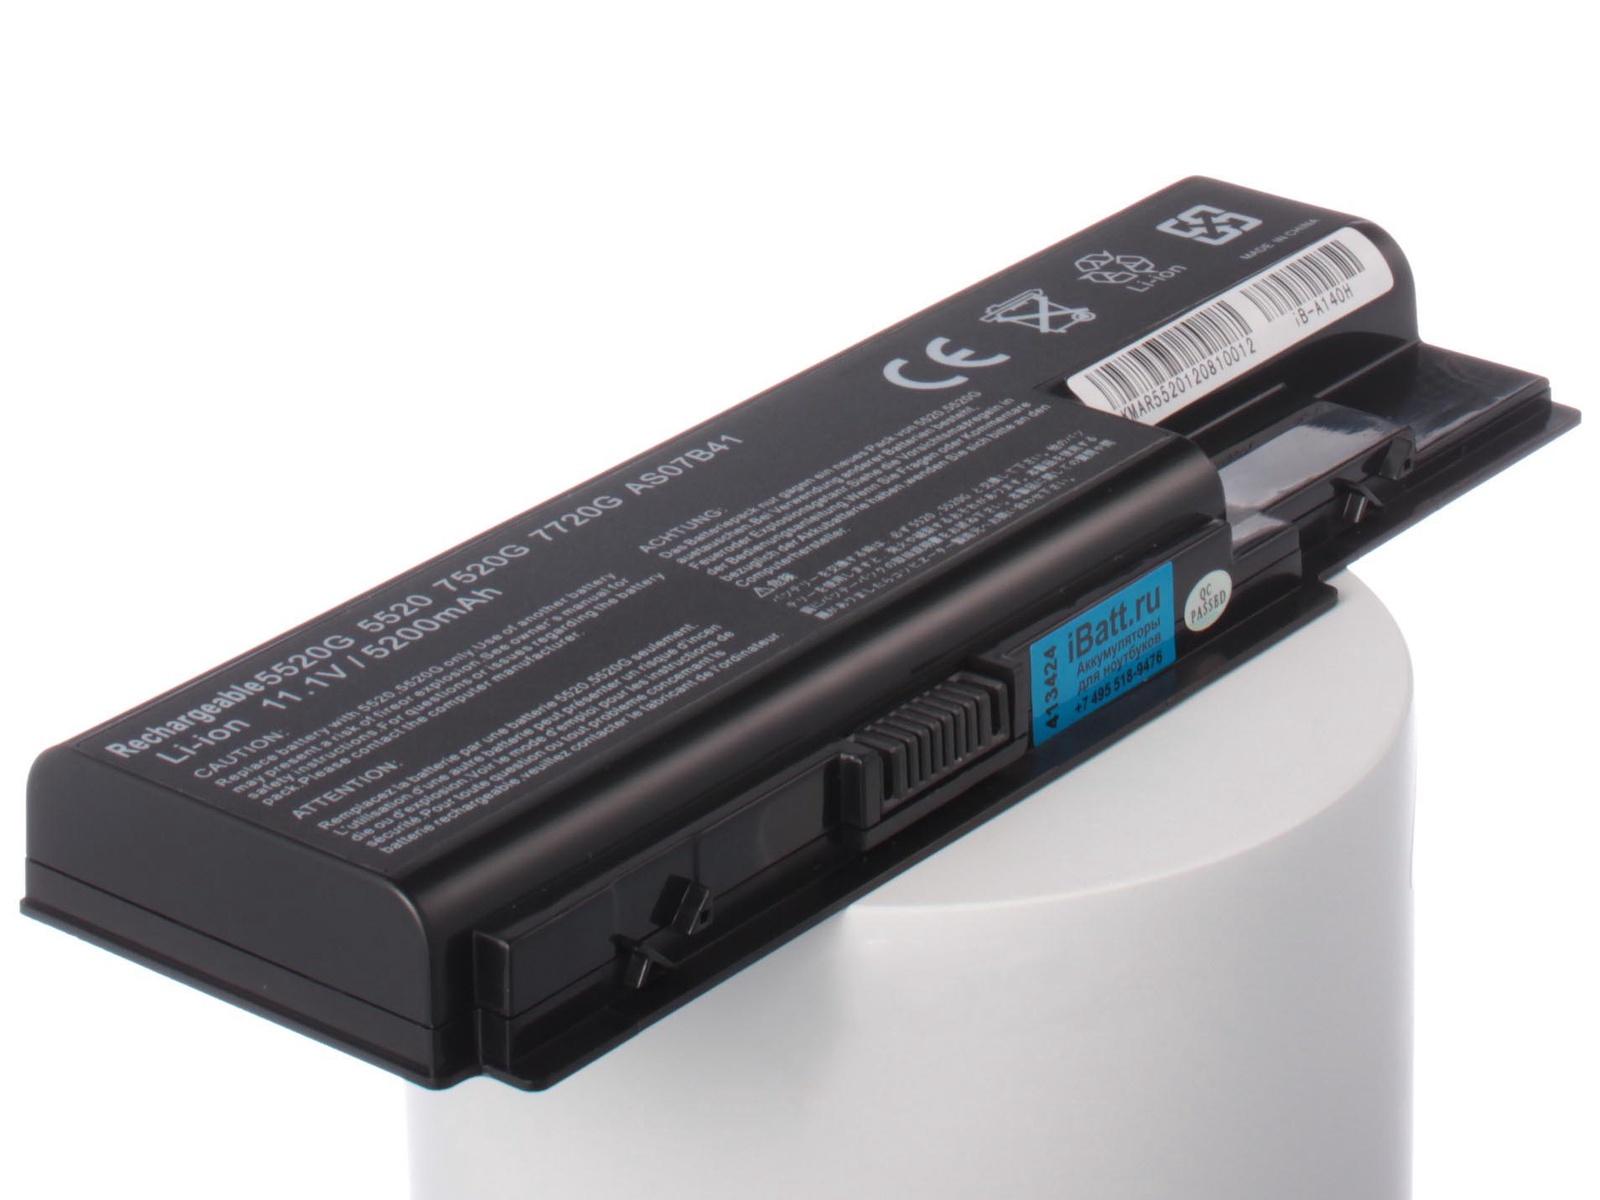 Аккумулятор для ноутбука iBatt Acer, eMachines, Packard Bell, Acer AS07B31, AS07B51, AS07B41, AS07B42, AS07B32, AS07B61, AS07B71, AS07B72, BT.00604.025, AS07B52, BT.00607.010, BT.00804.024